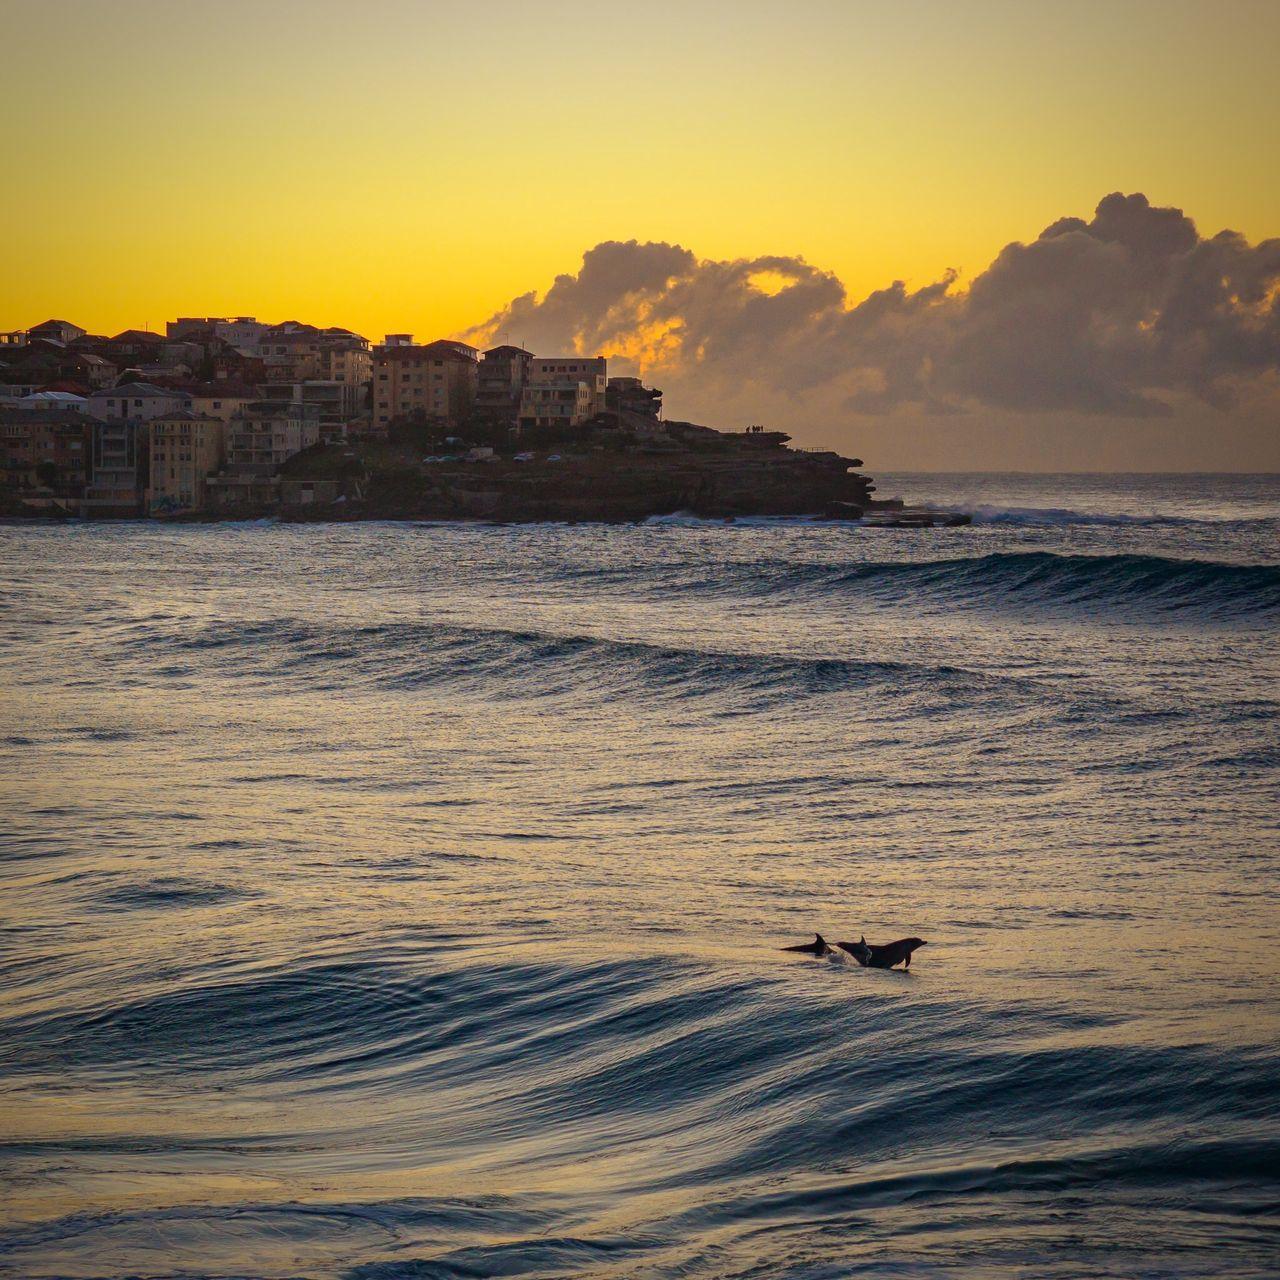 Dolphin Photobomb 🐬💣🐬 at Bondi Yesterday Morning. #olympusinspired Dolphins Bondi Ocean